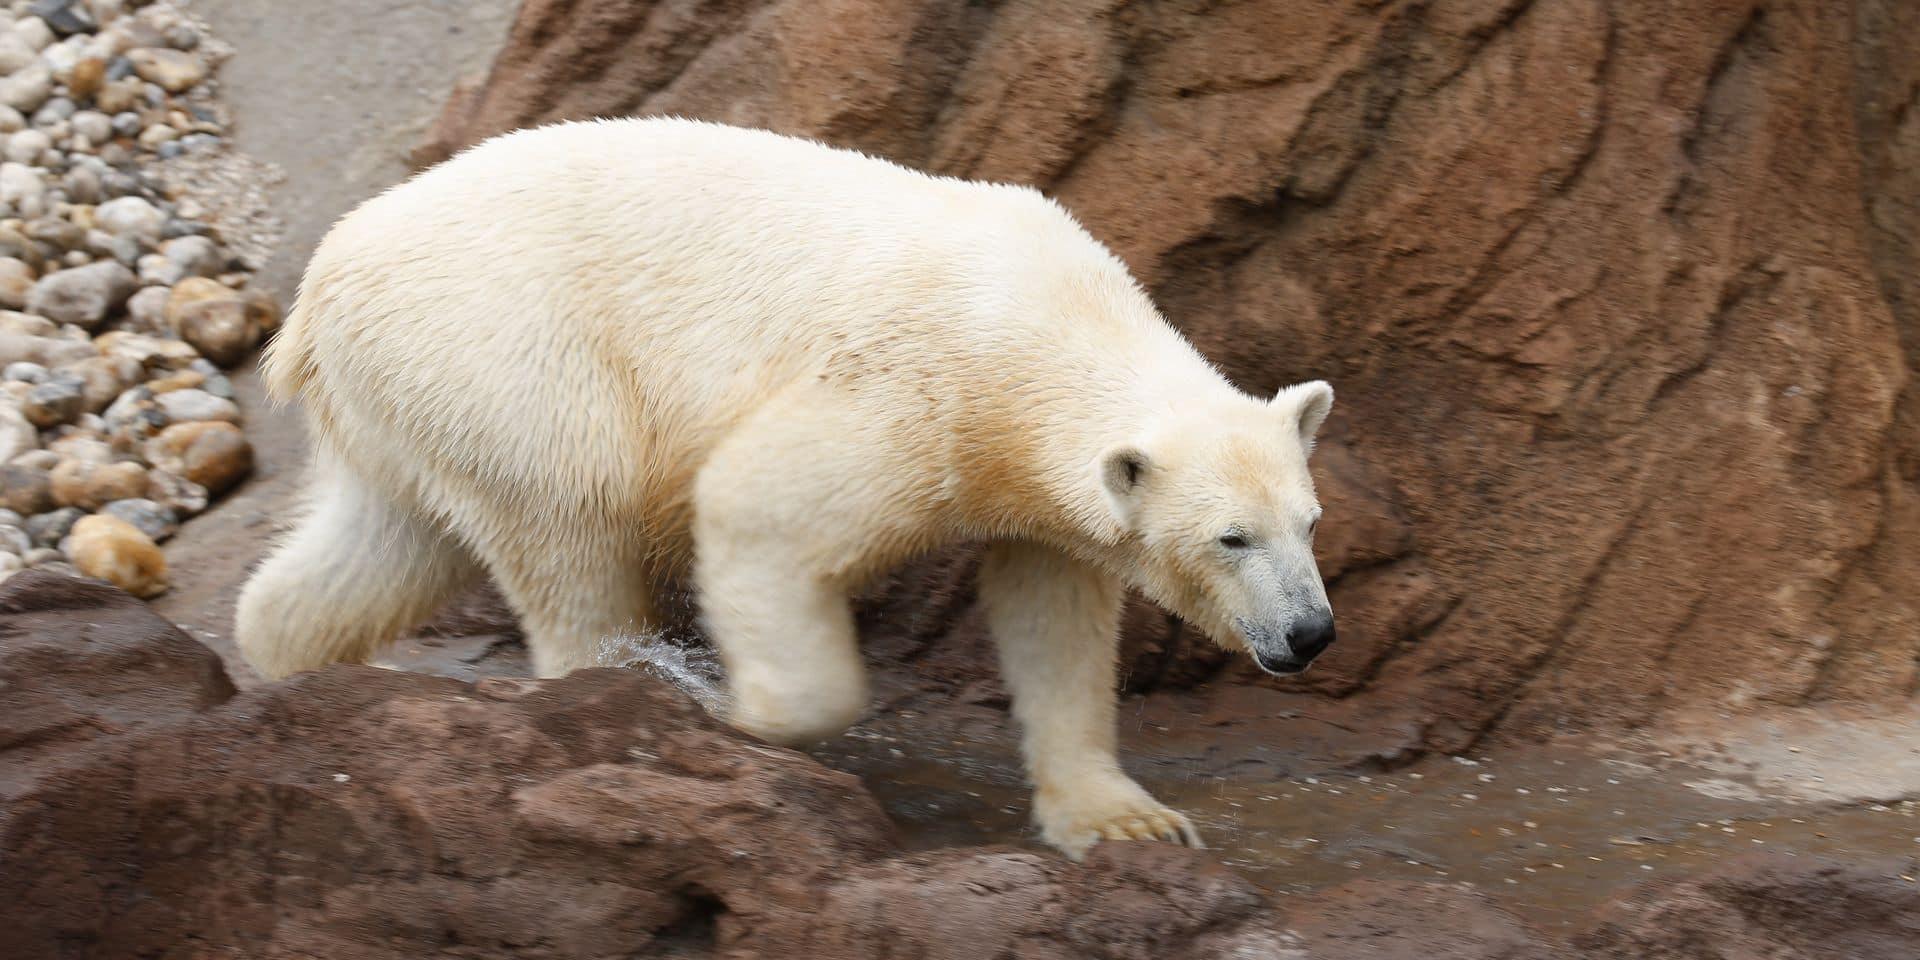 Pairi Daiza : moment exceptionnel à la Terre du froid